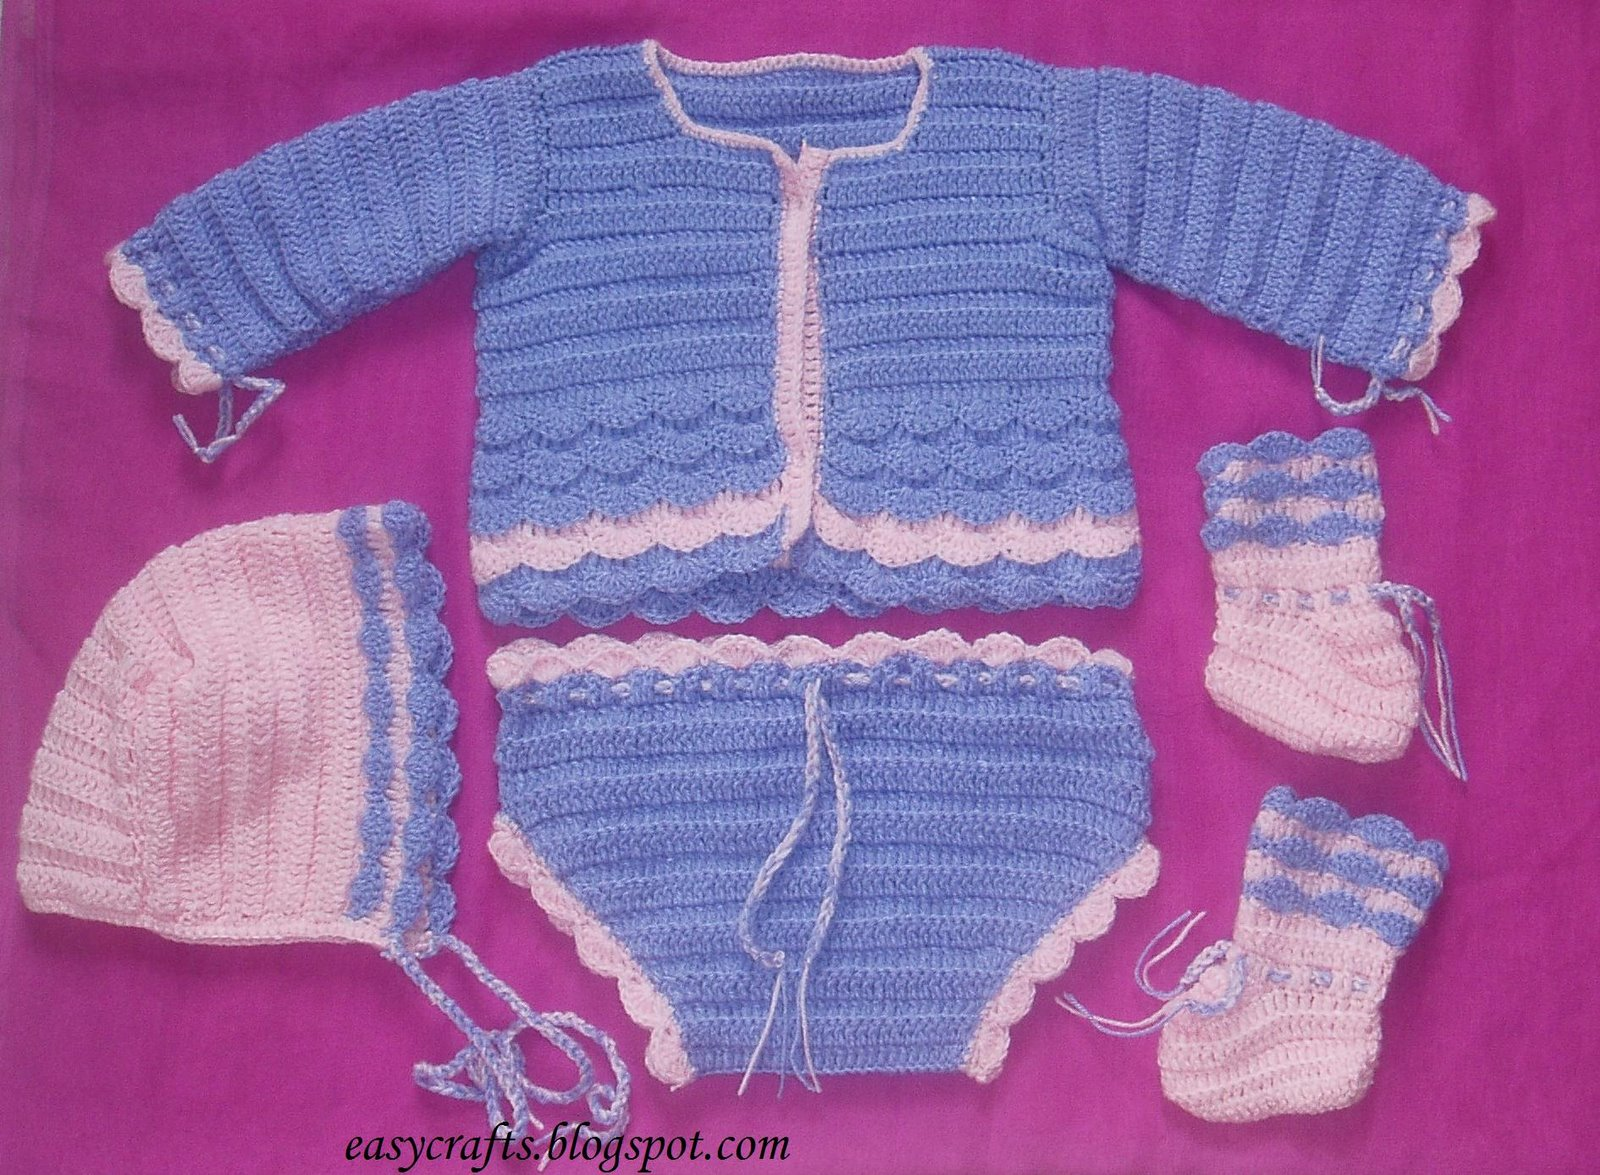 Easy Crafts - Explore your creativity: Baby winter set